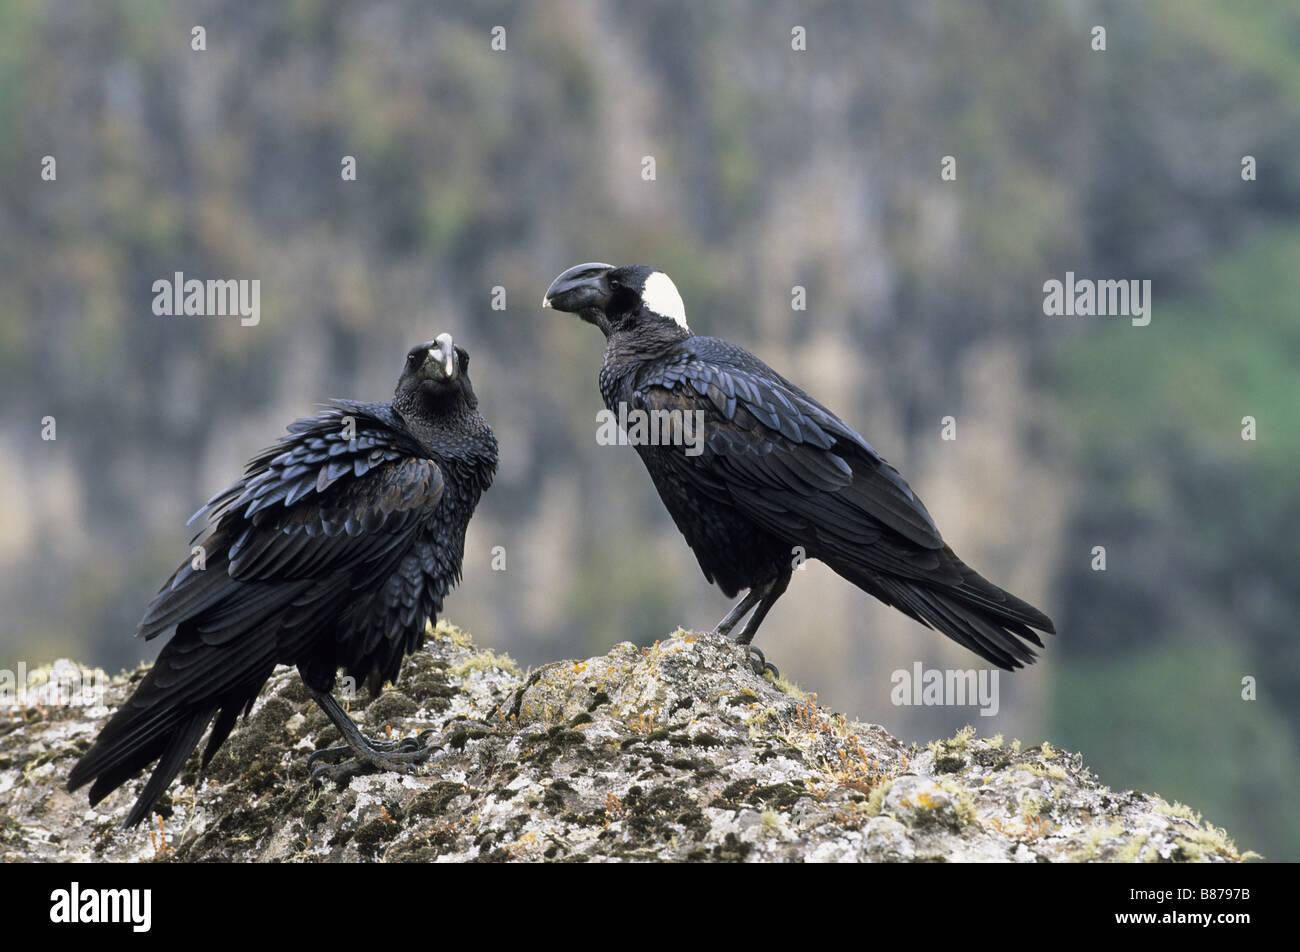 two thick-billed ravens / Corvus crassirostris - Stock Image